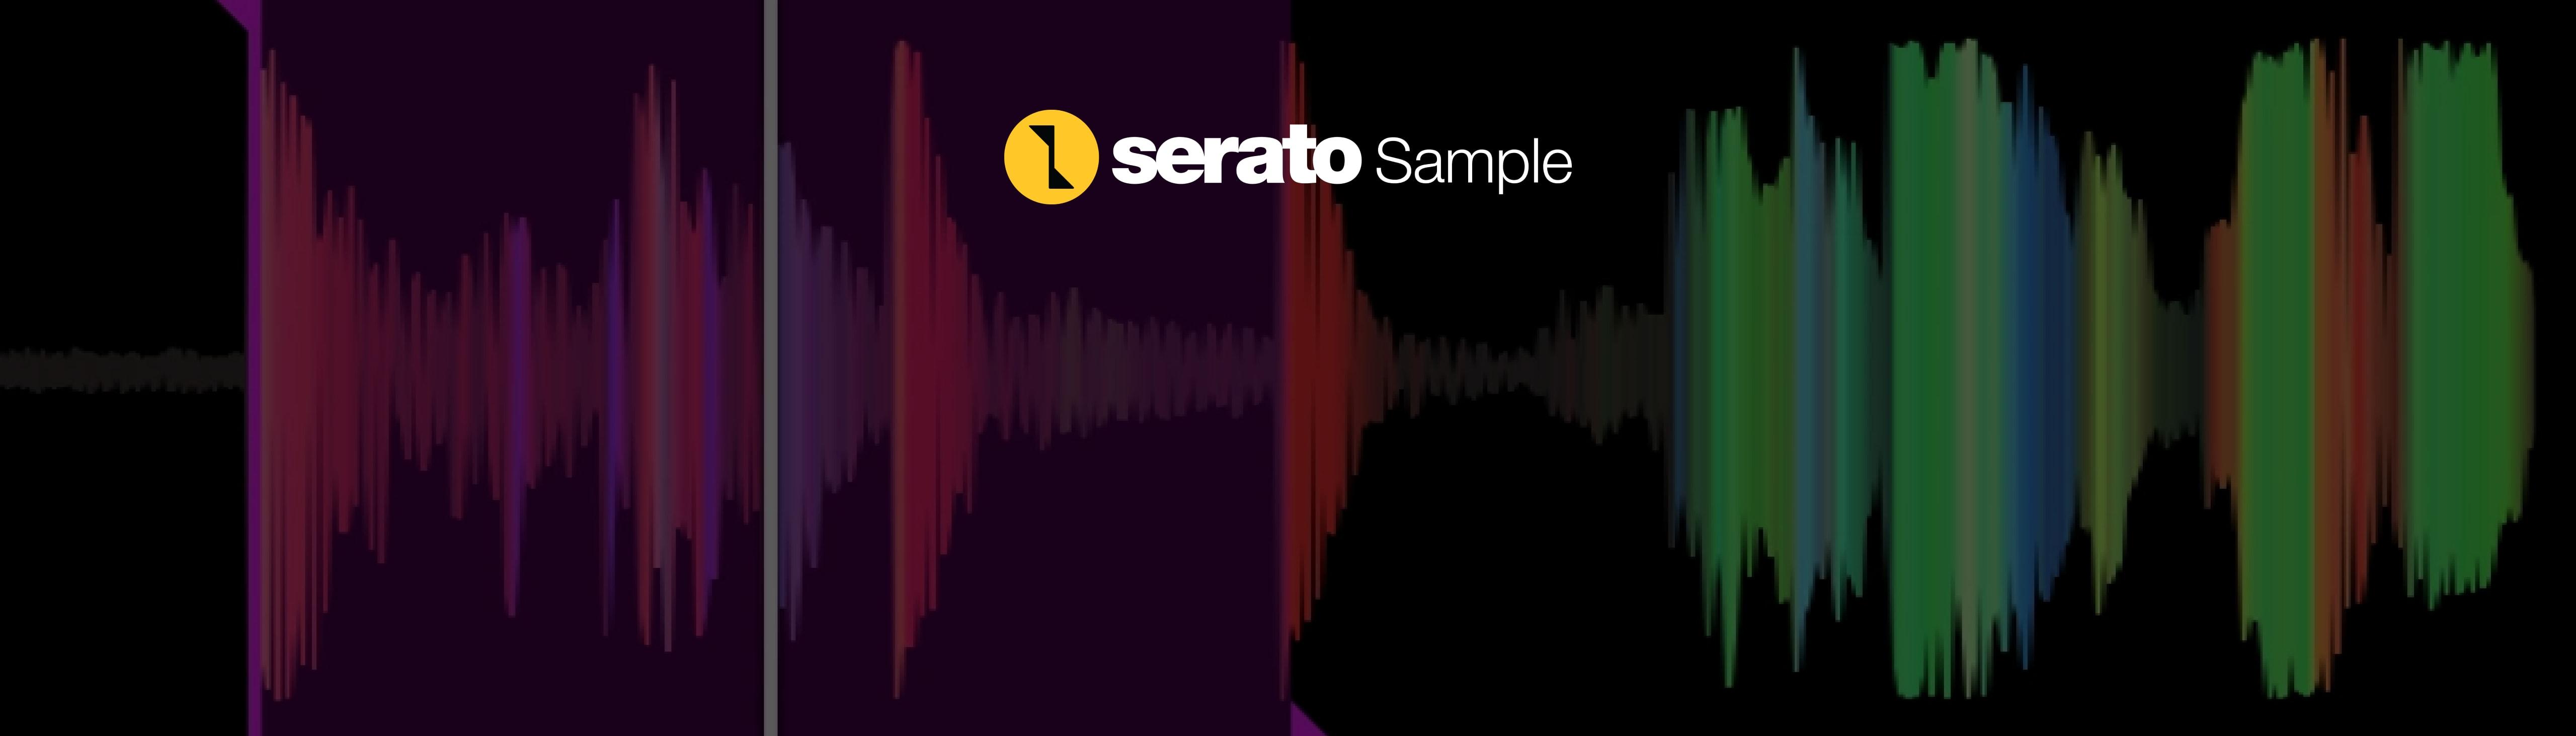 Serato Sample header